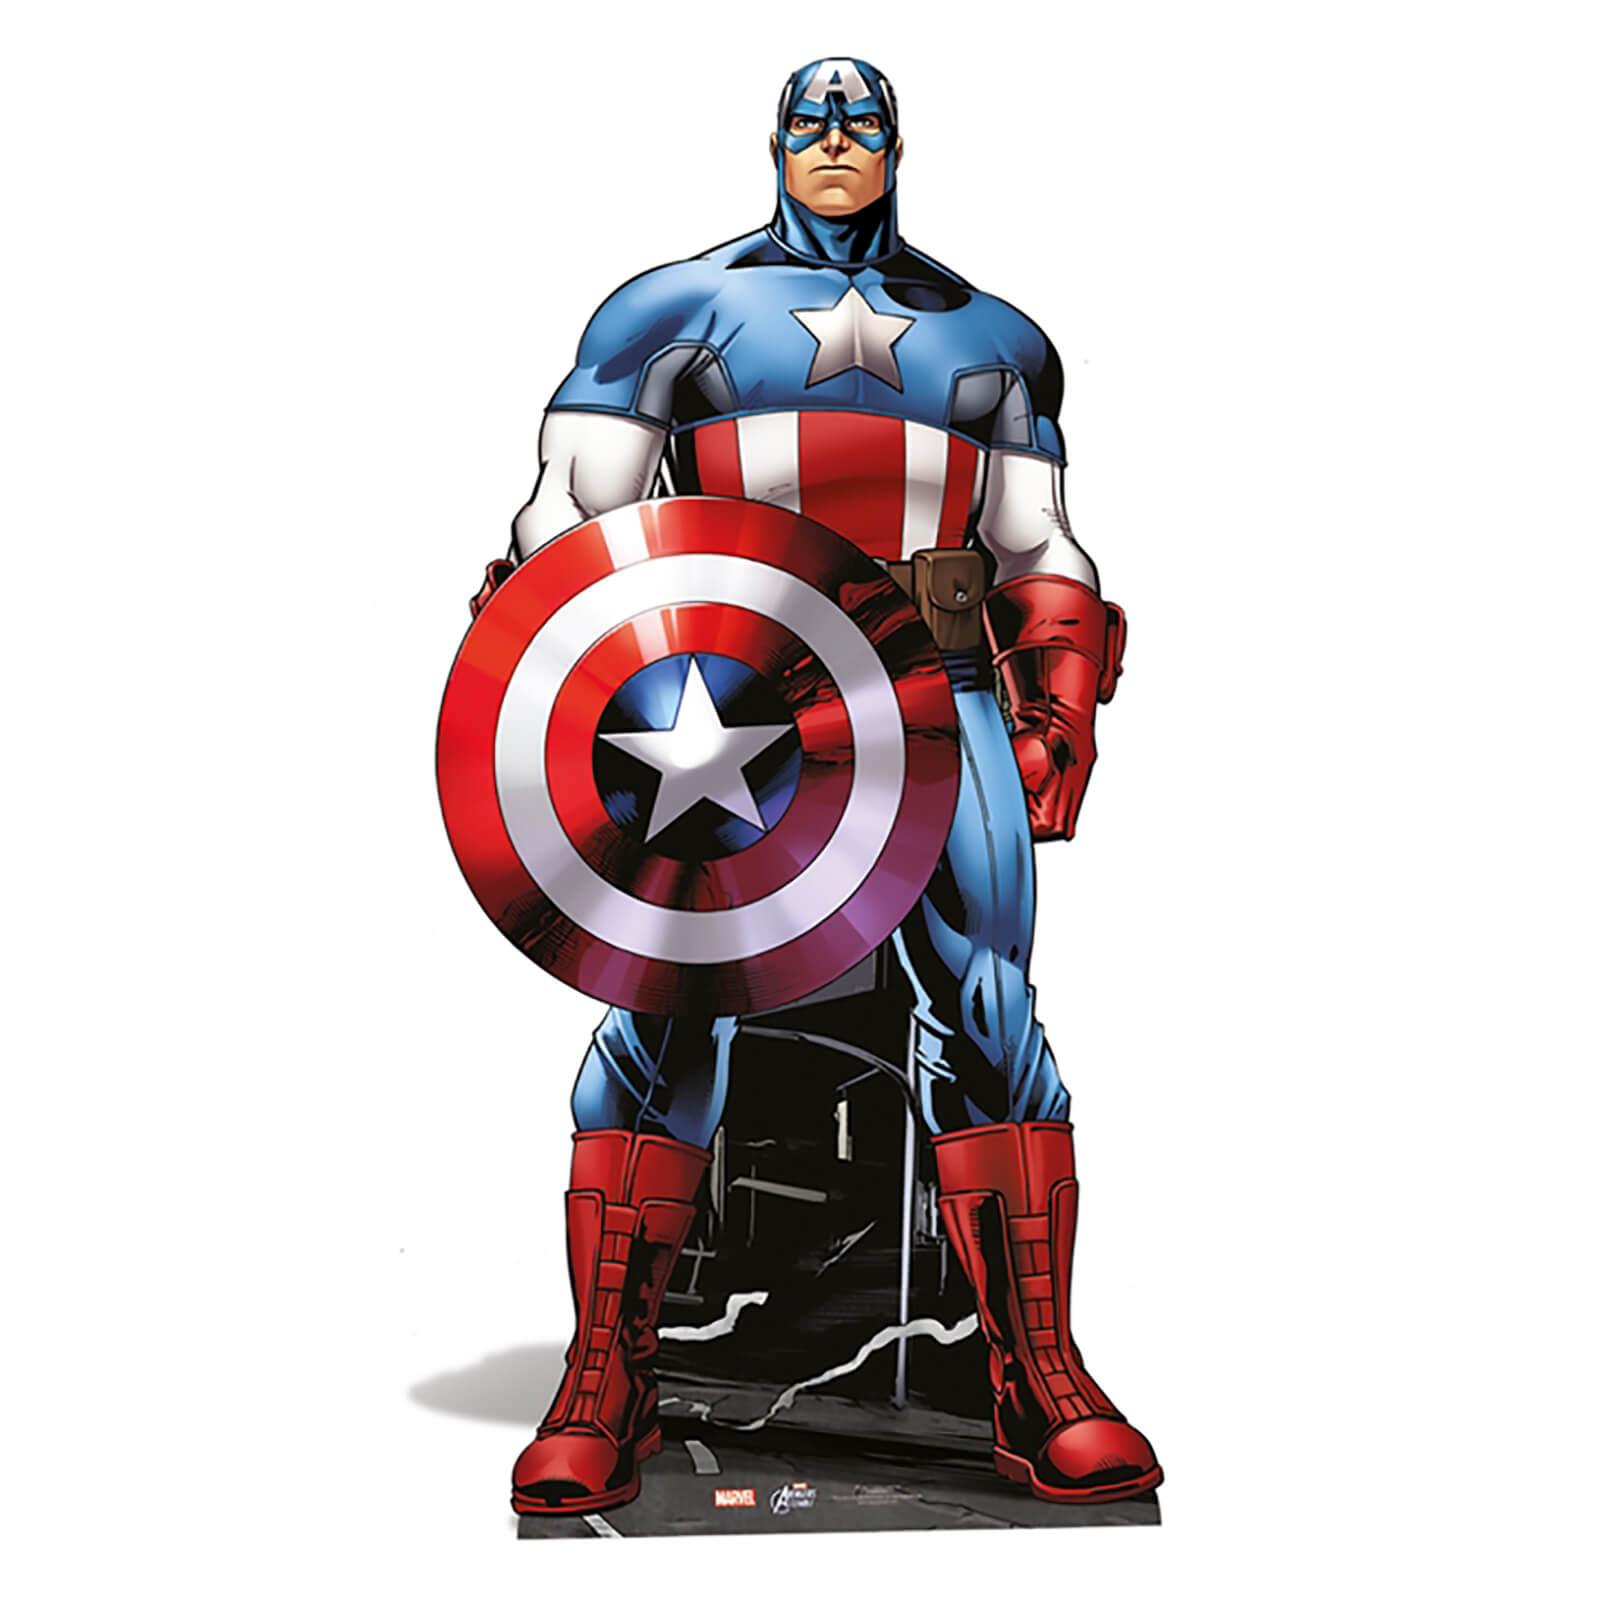 Image of Marvel - Captain America Mini Cardboard Cut Out